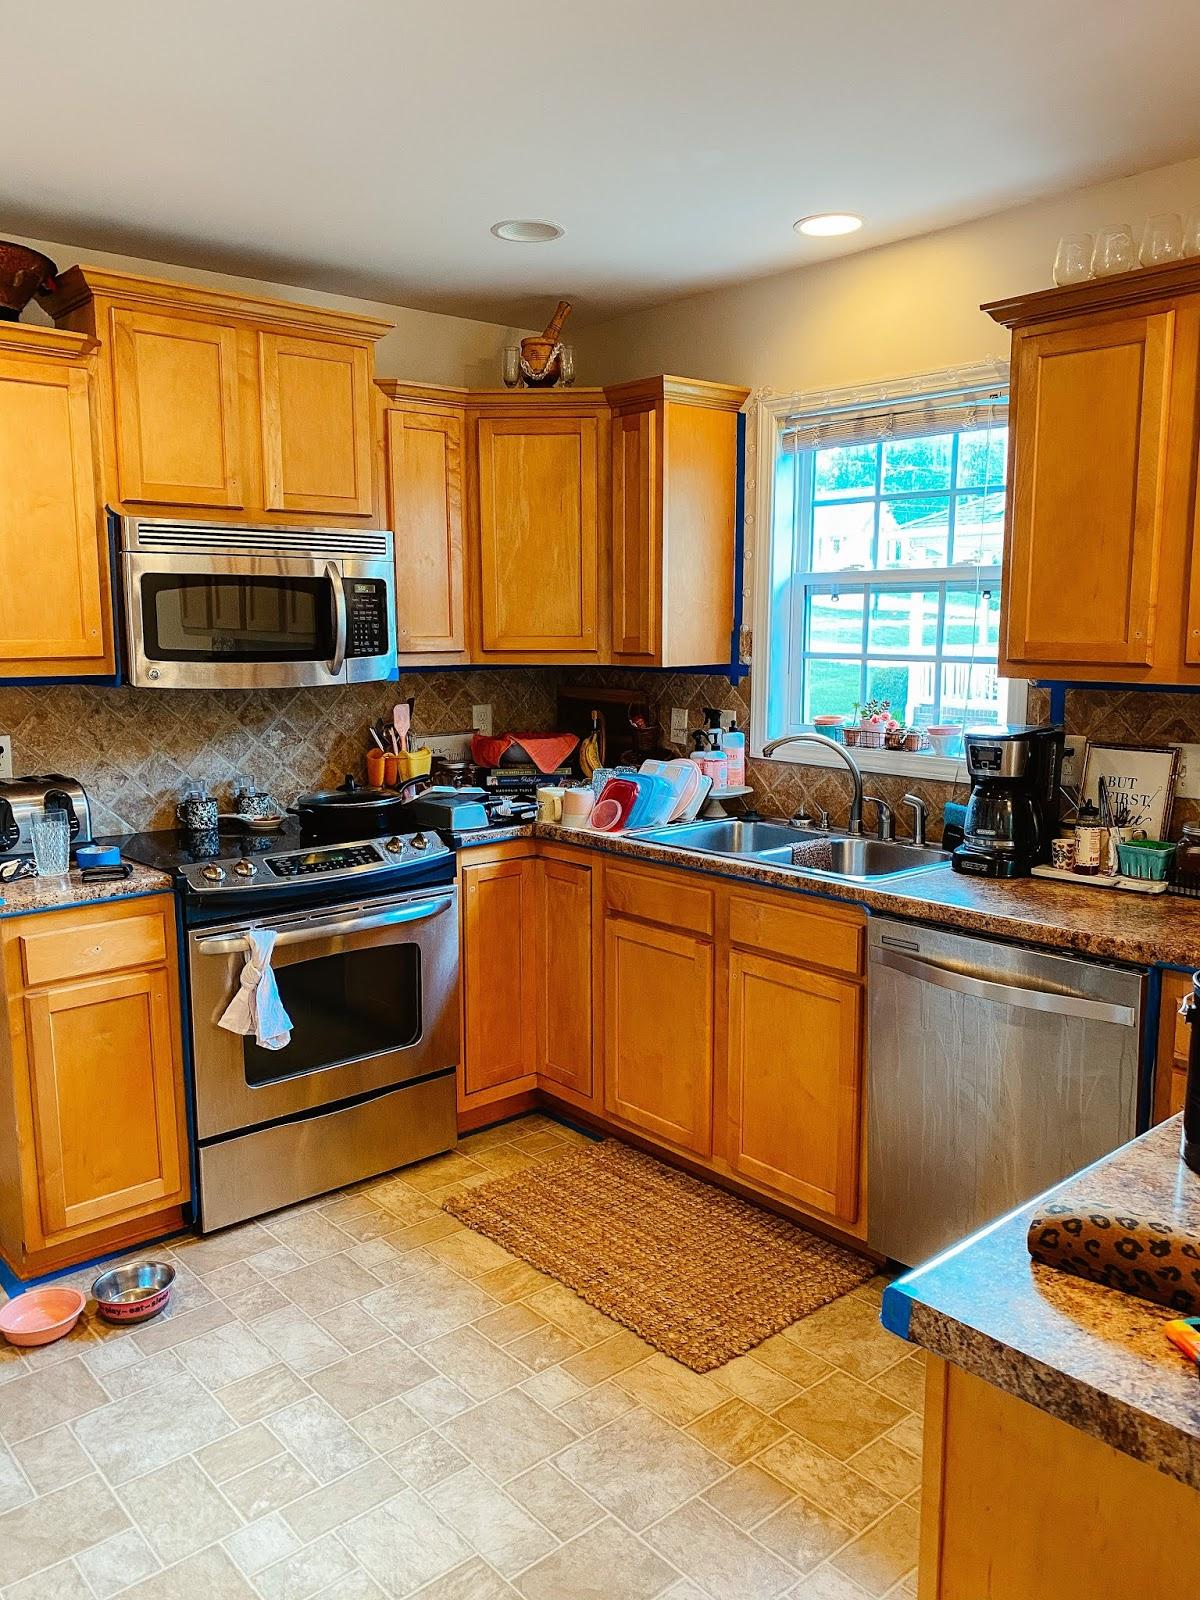 diy, kitchen refresh, painted cabinets, home project, nc blogger, north carolina blogger